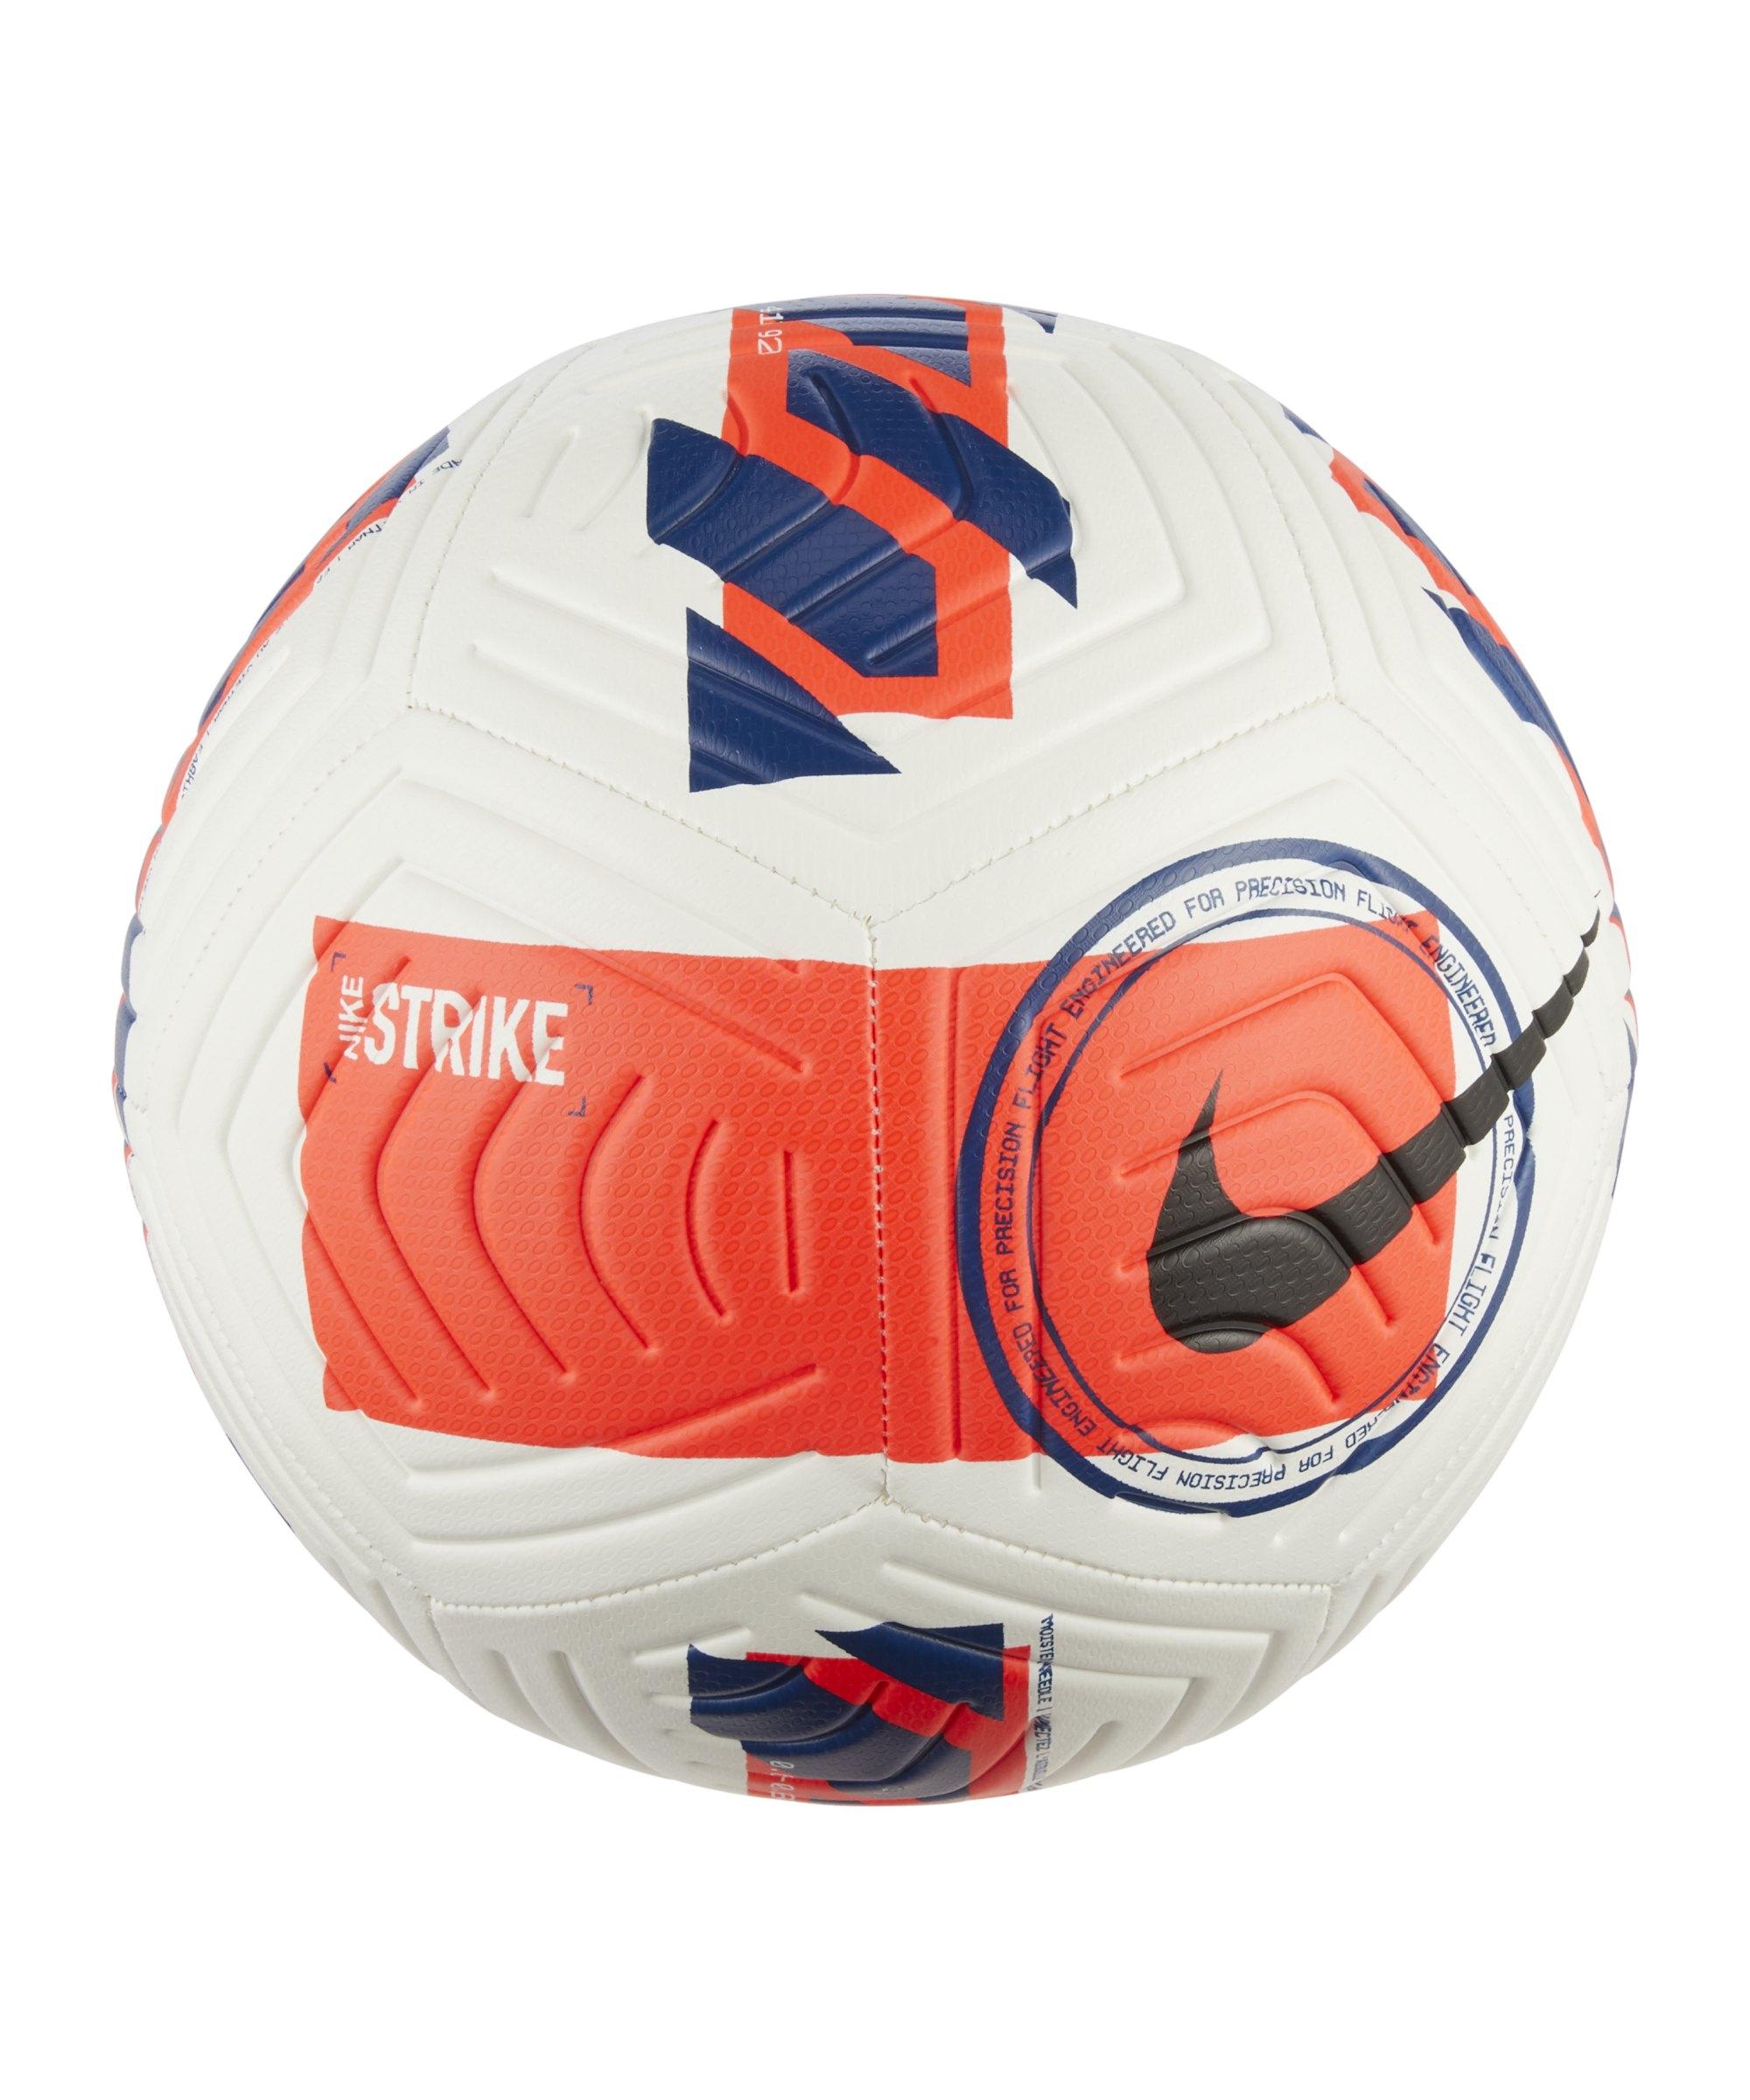 Nike Russland Premier League Strike Ball F100 - weiss